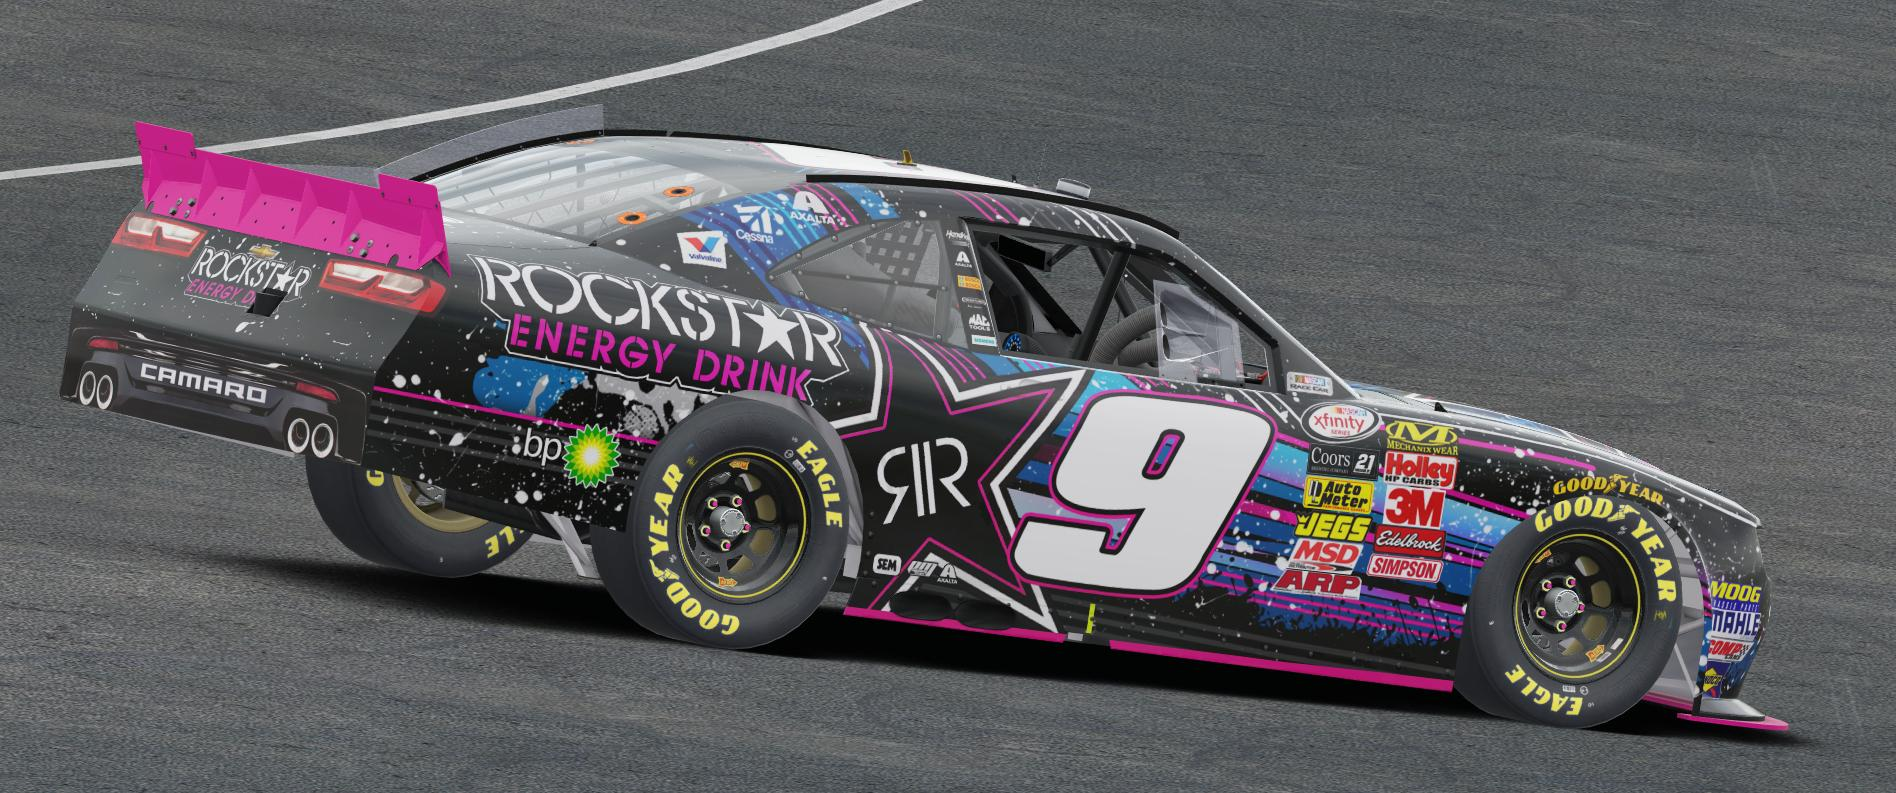 Preview of WK16 Painters Contest- Rockstar Energy Drink Camaro by Preston Pardus